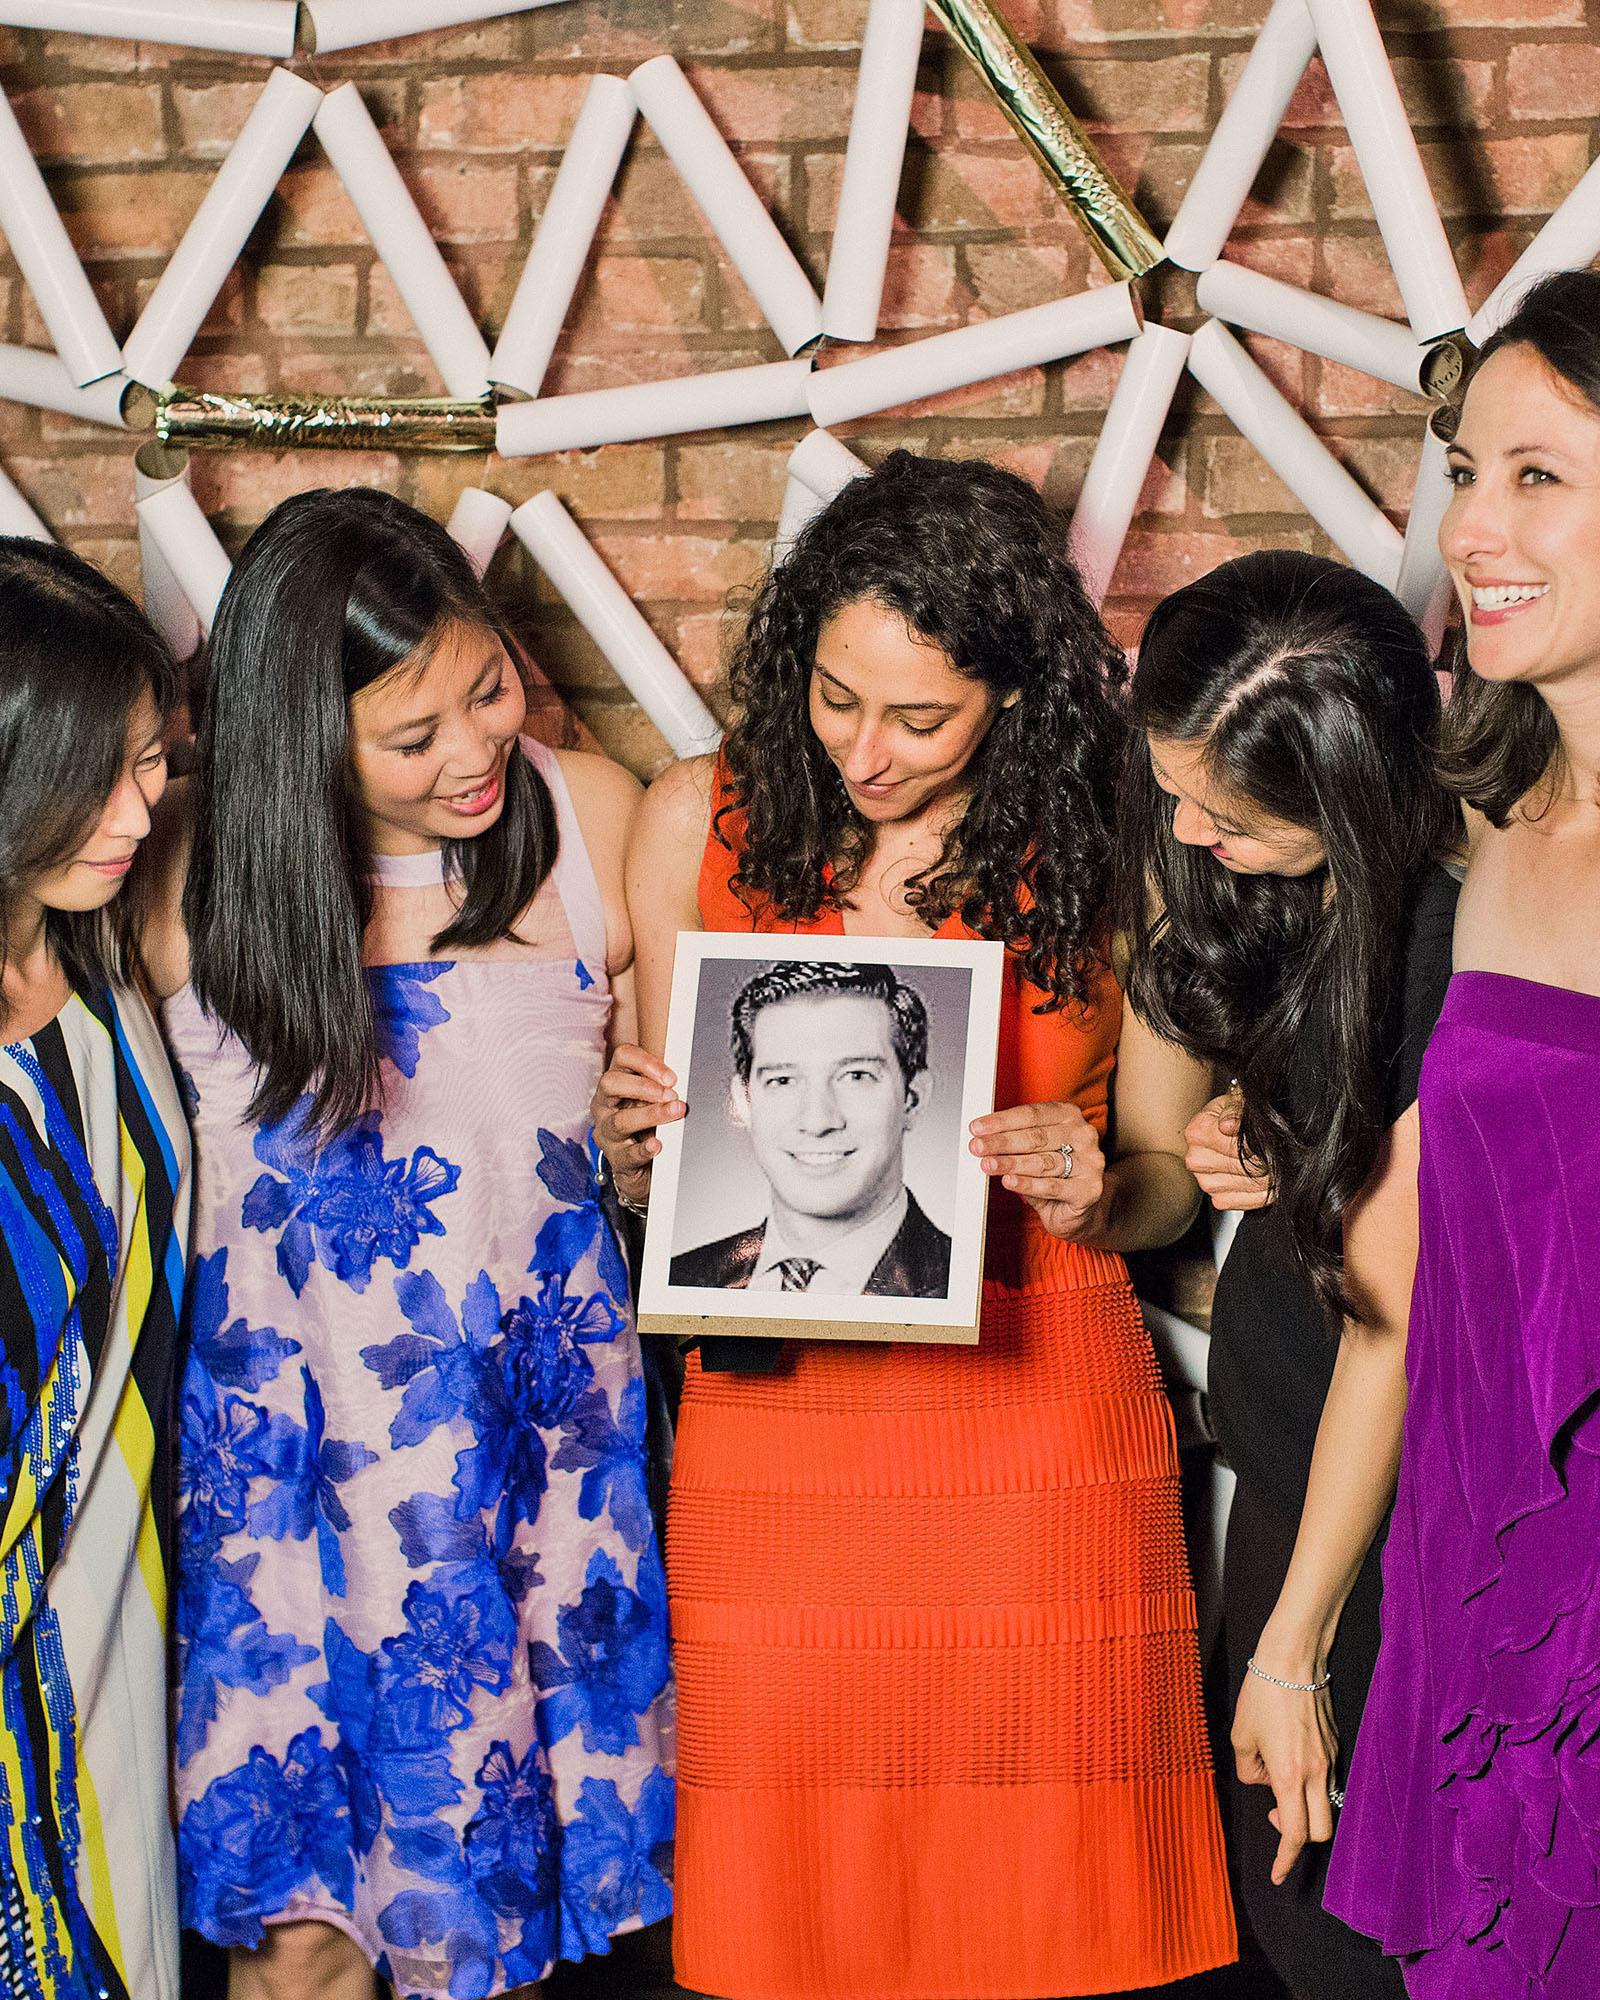 risa ross wedding brooklyn new york photo booth props